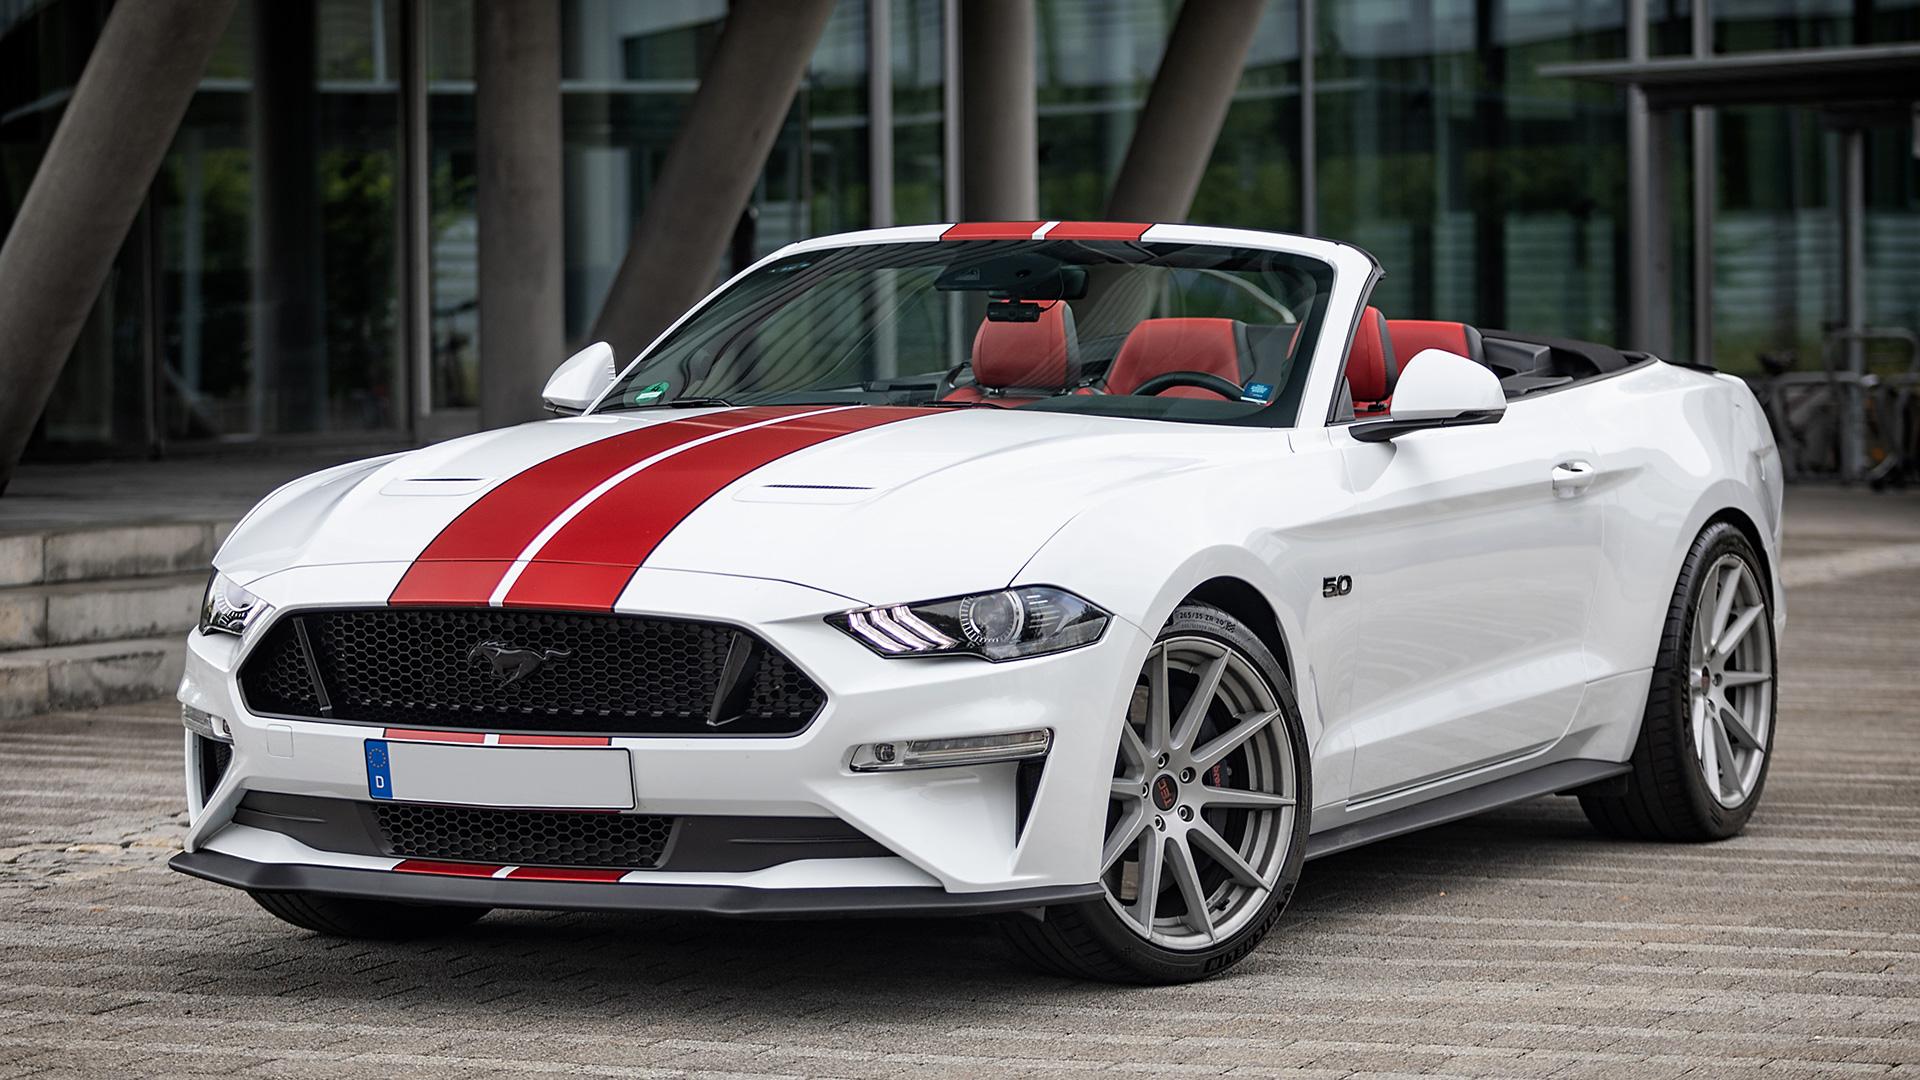 Ford Mustang Ausfahrt